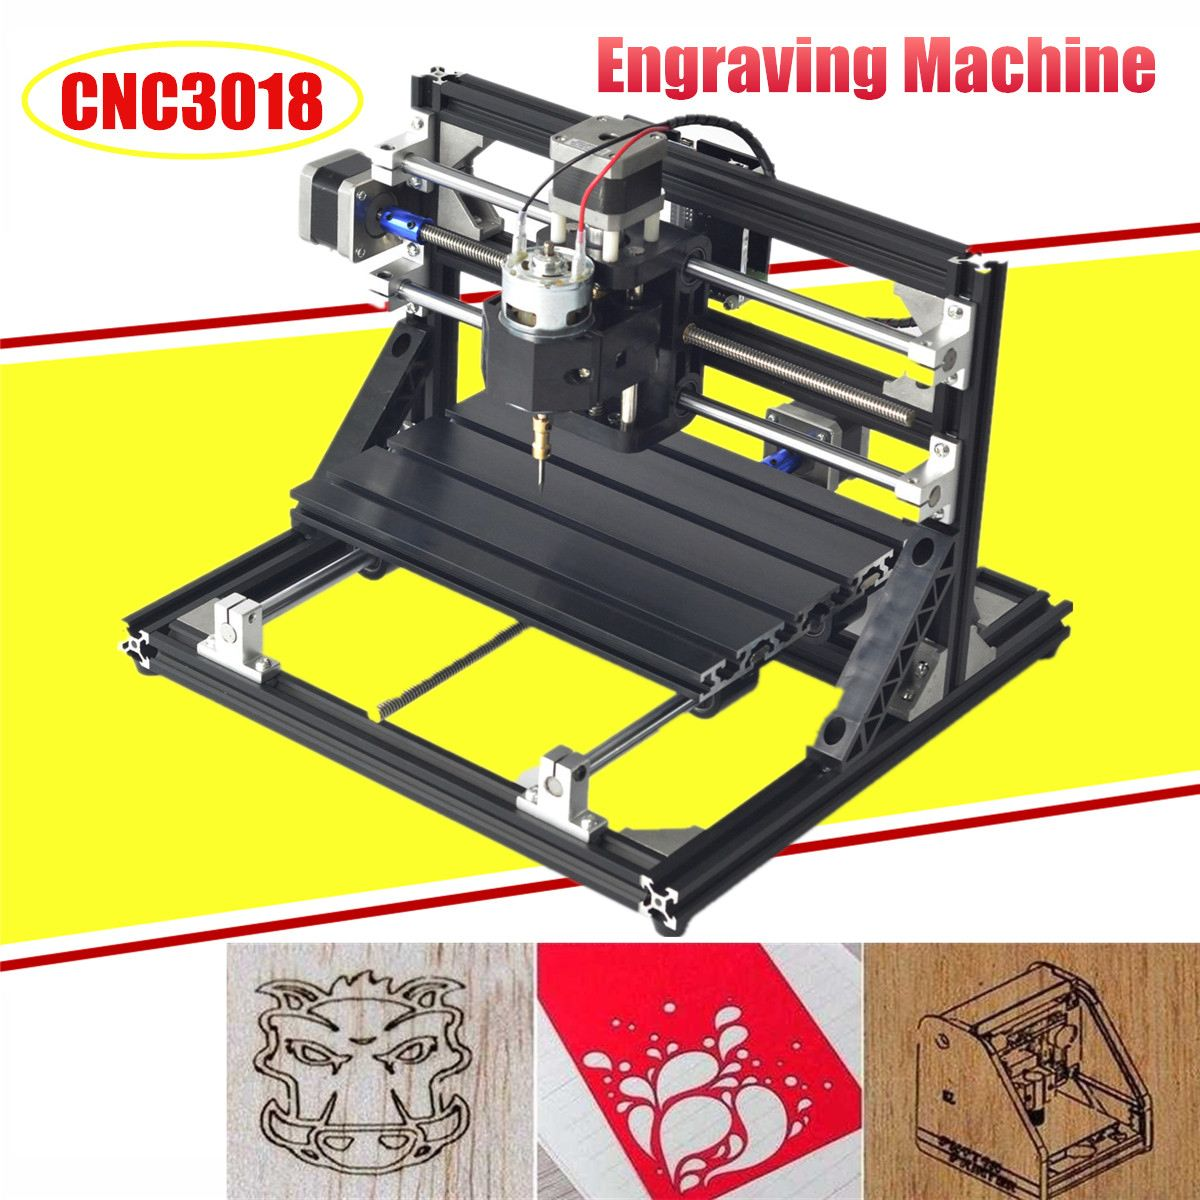 CNC3018,diy mini cnc engraving machine,laser engraving,Pcb PVC Milling Machine,wood router,cnc 3018,best Advanced toysCNC3018,diy mini cnc engraving machine,laser engraving,Pcb PVC Milling Machine,wood router,cnc 3018,best Advanced toys